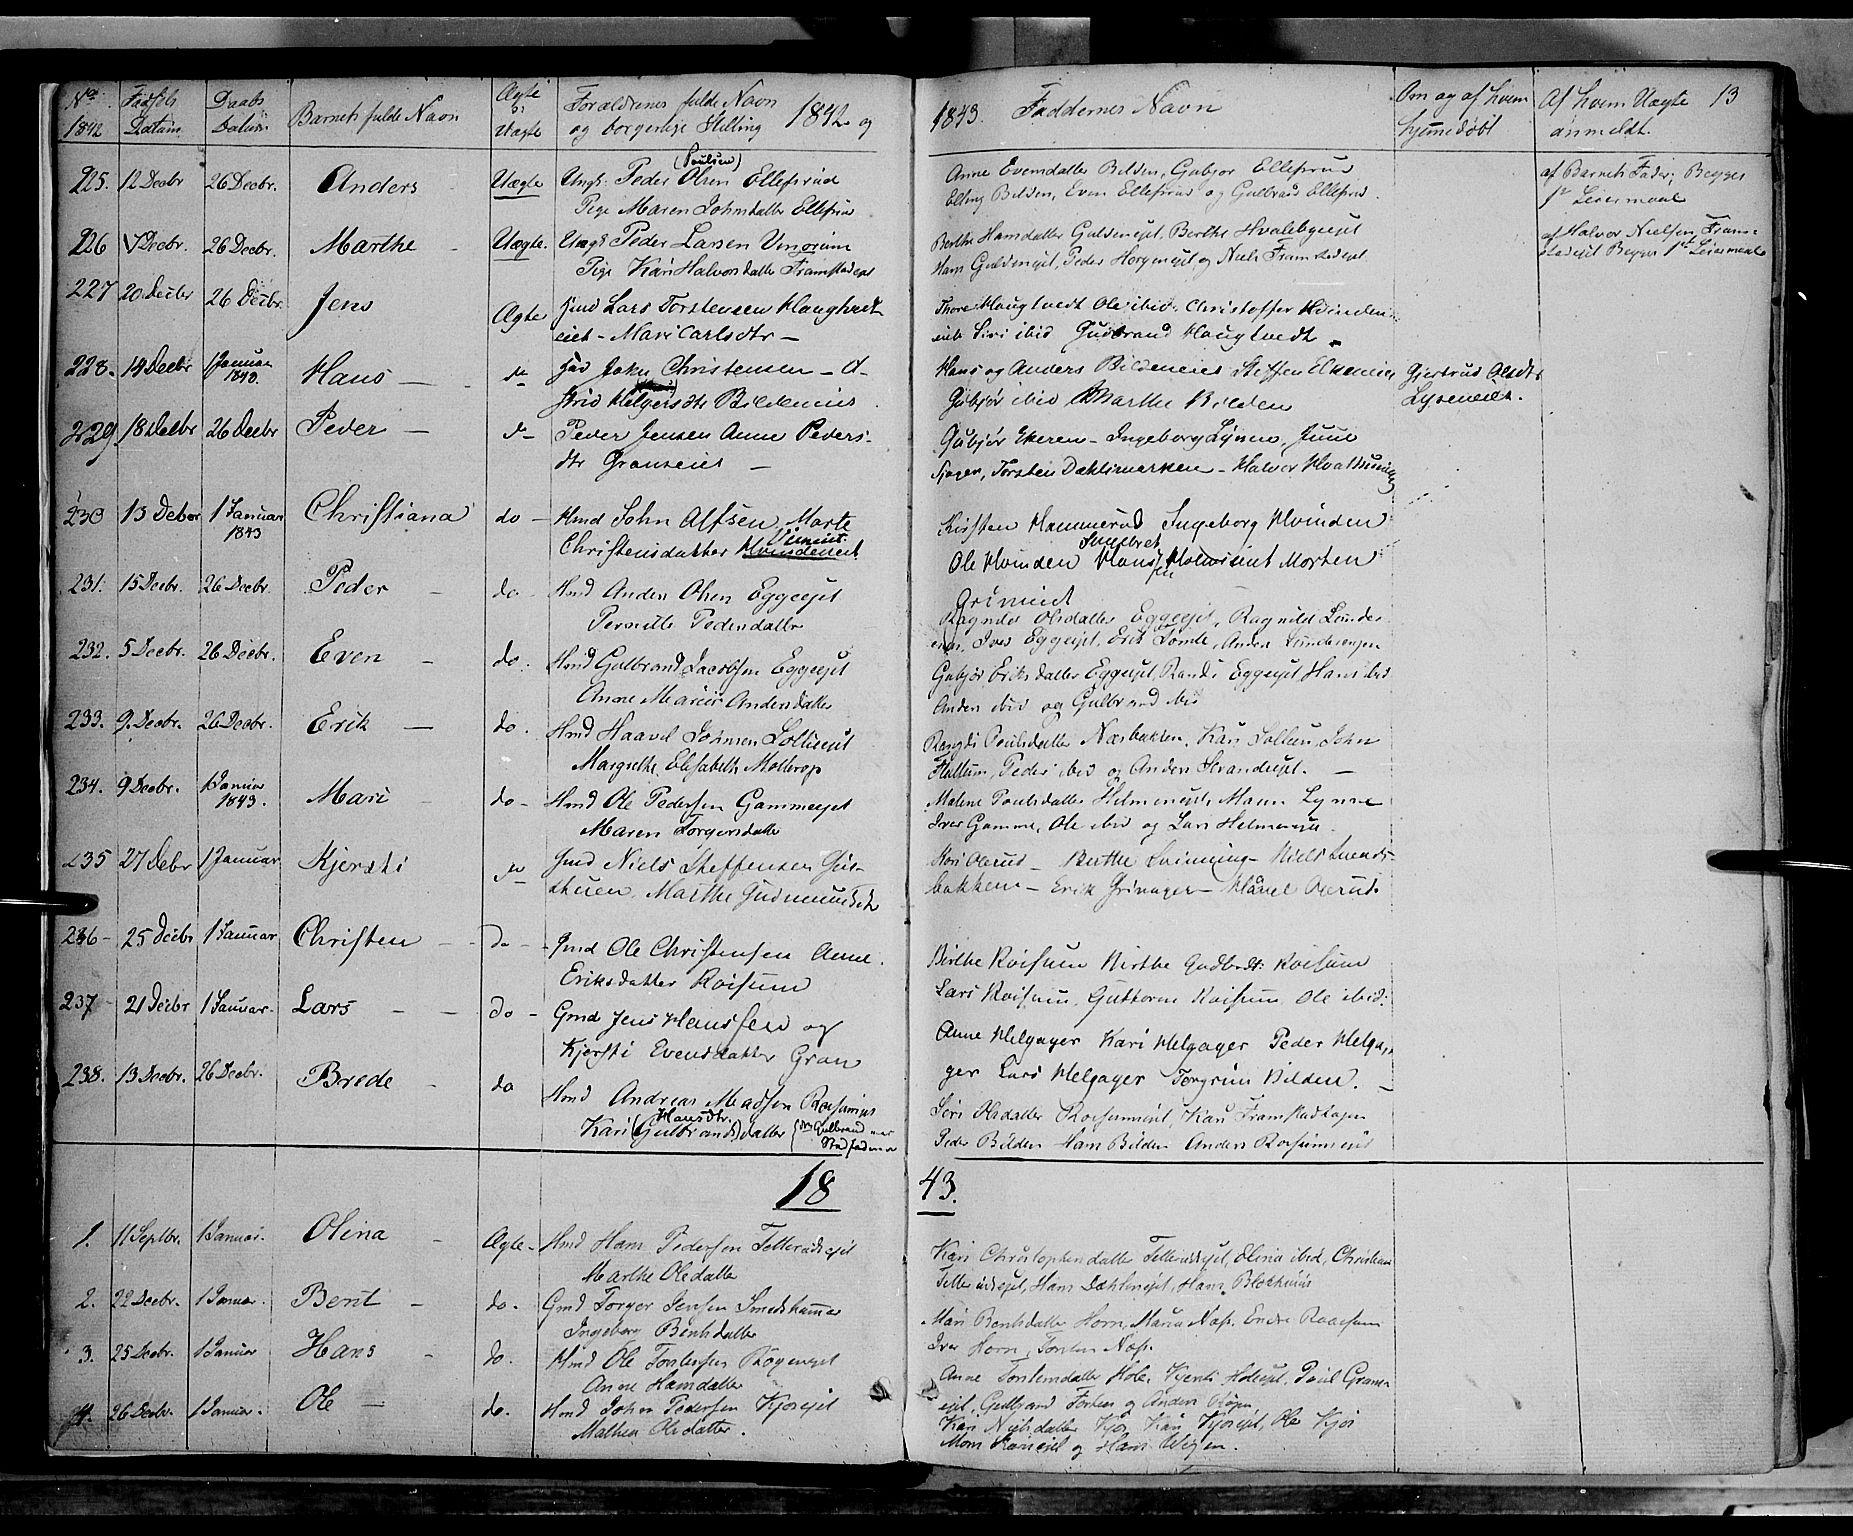 SAH, Gran prestekontor, Ministerialbok nr. 11, 1842-1856, s. 12-13